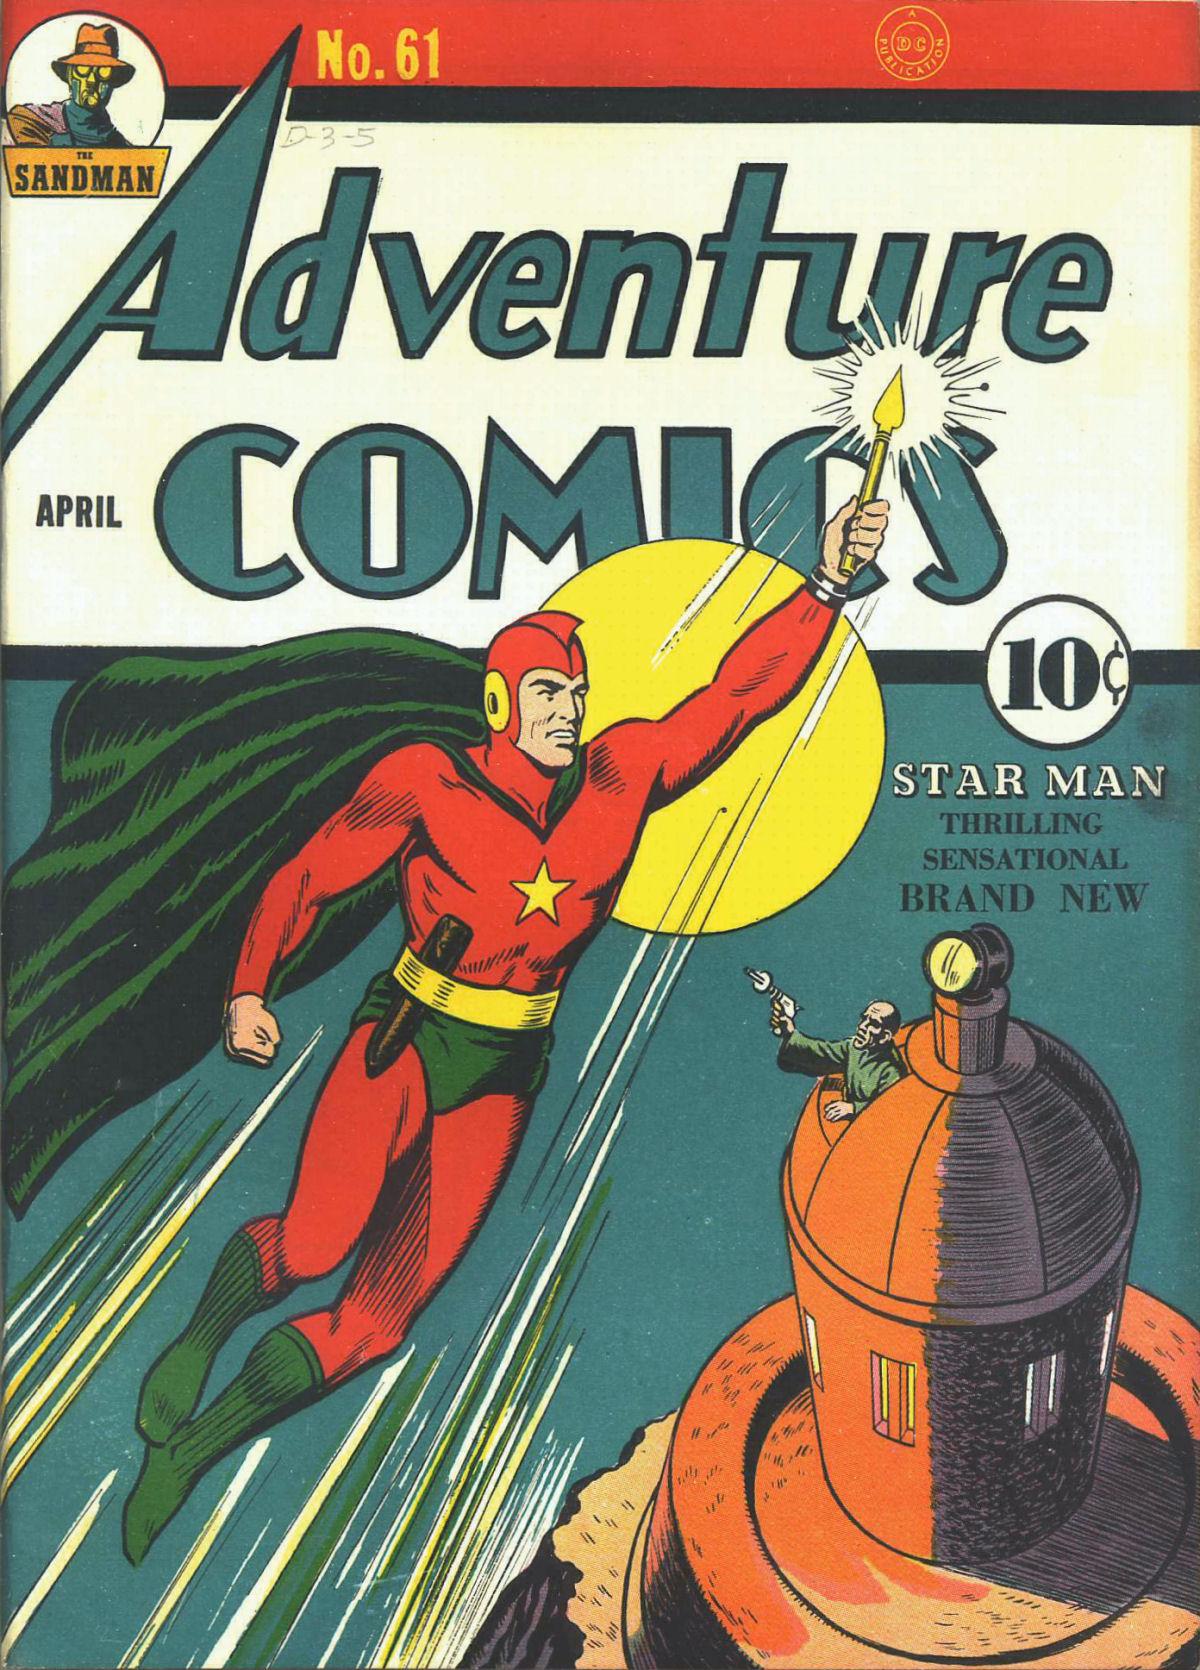 Read online Adventure Comics (1938) comic -  Issue #61 - 2